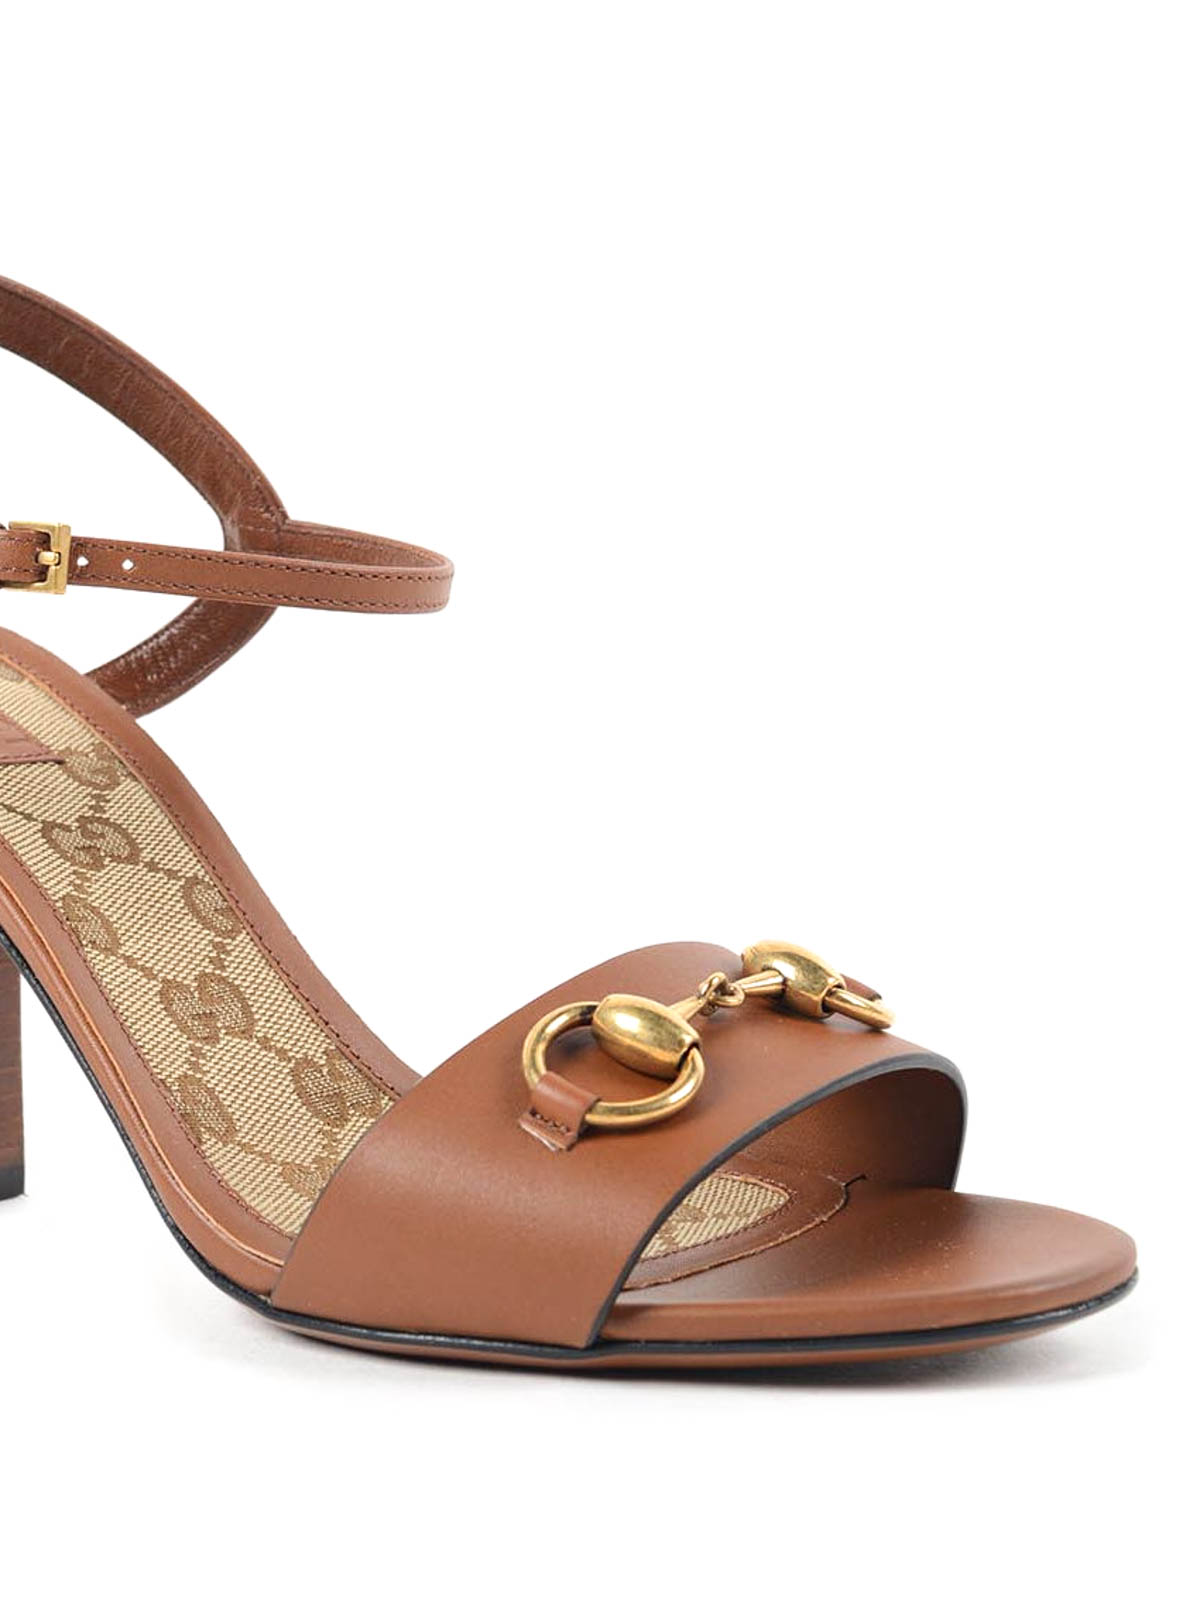 Gucci - Mid-heeled sandals - sandals